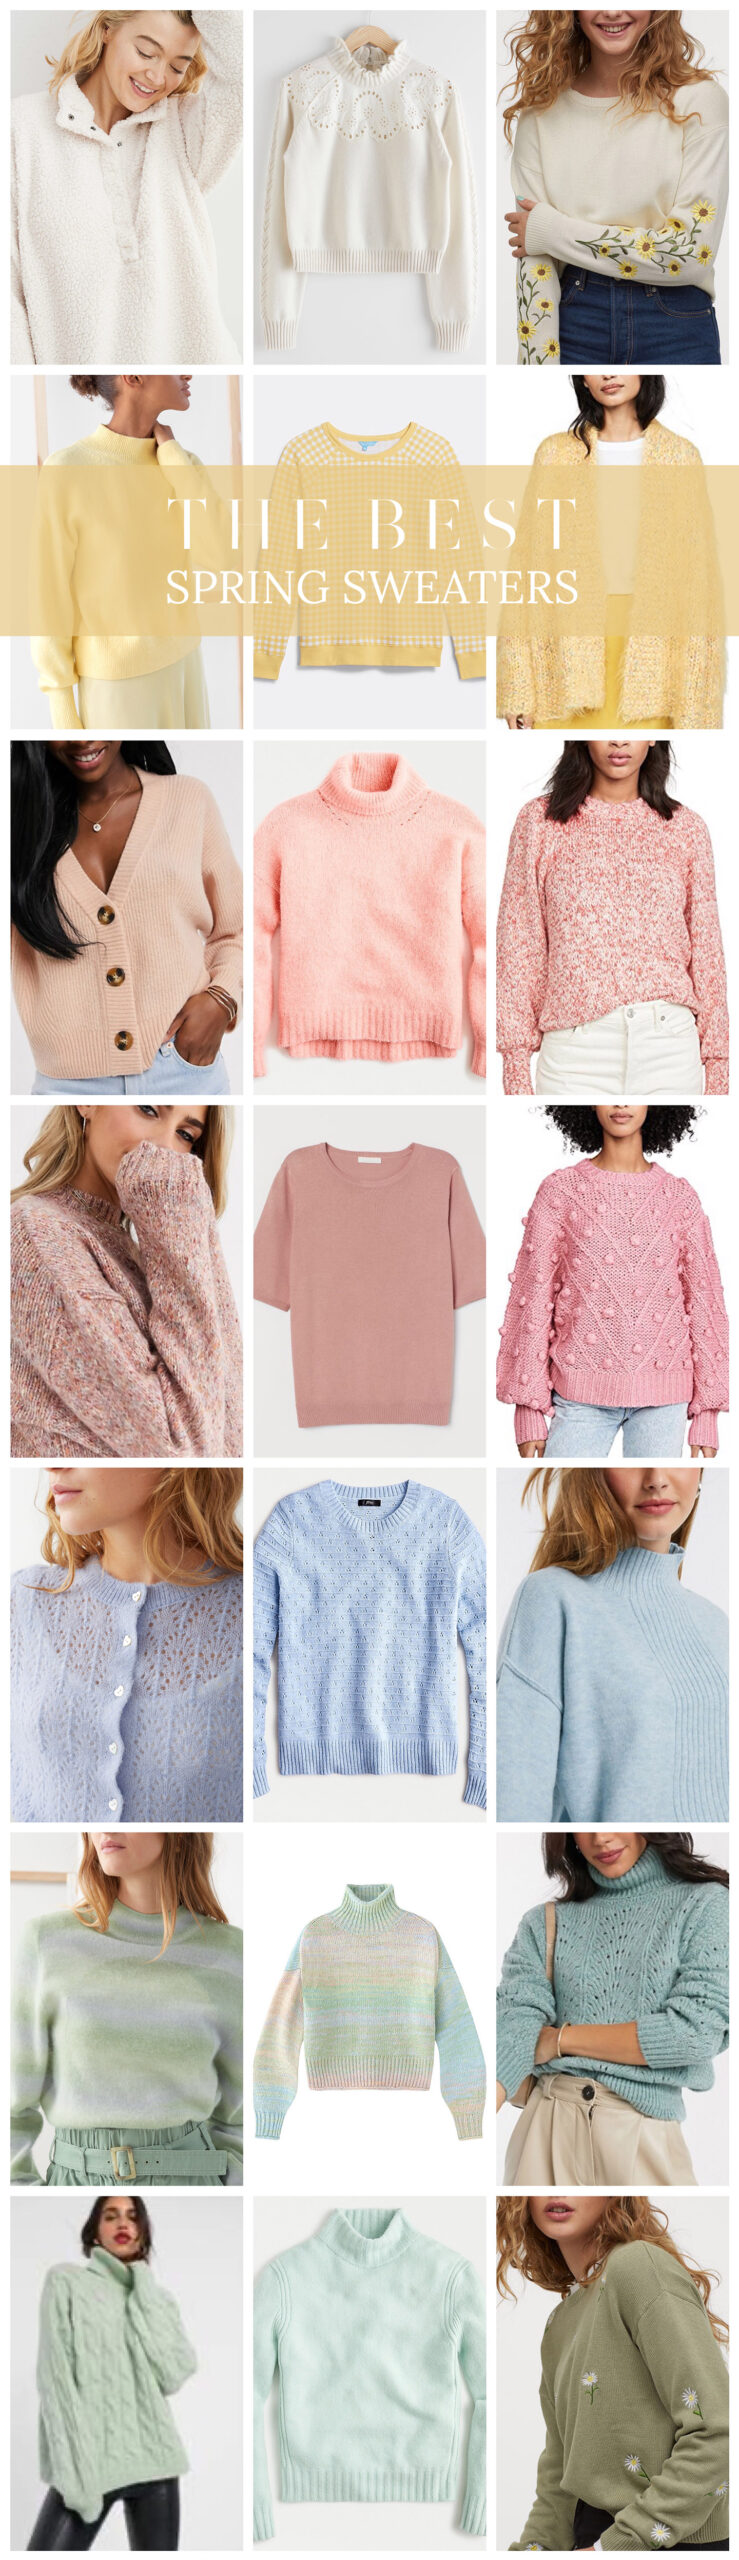 The Best Spring SweatersThe Best Spring Sweaters